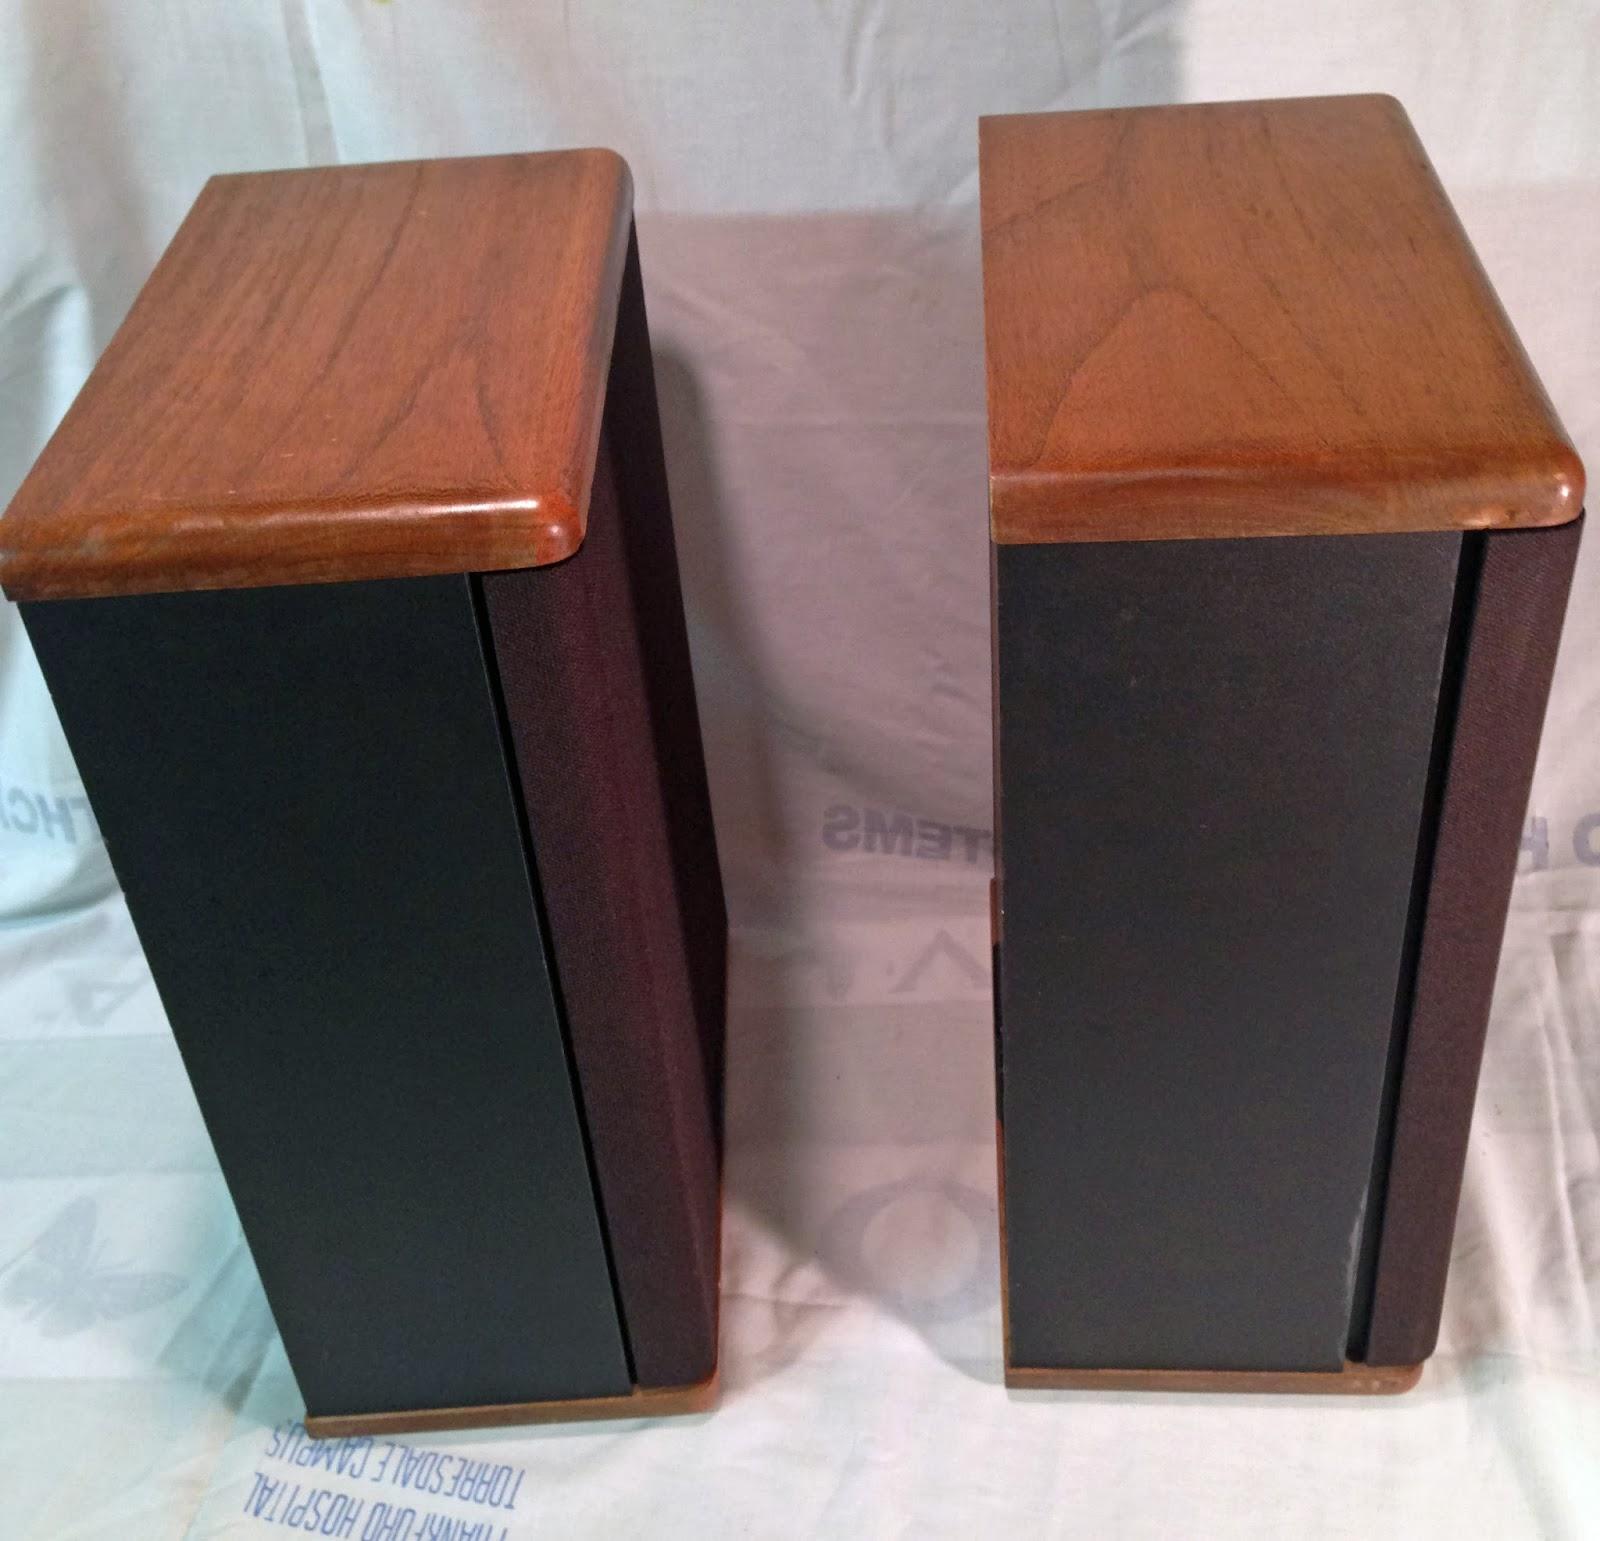 robert 39 s sound advent baby loudspeakers. Black Bedroom Furniture Sets. Home Design Ideas